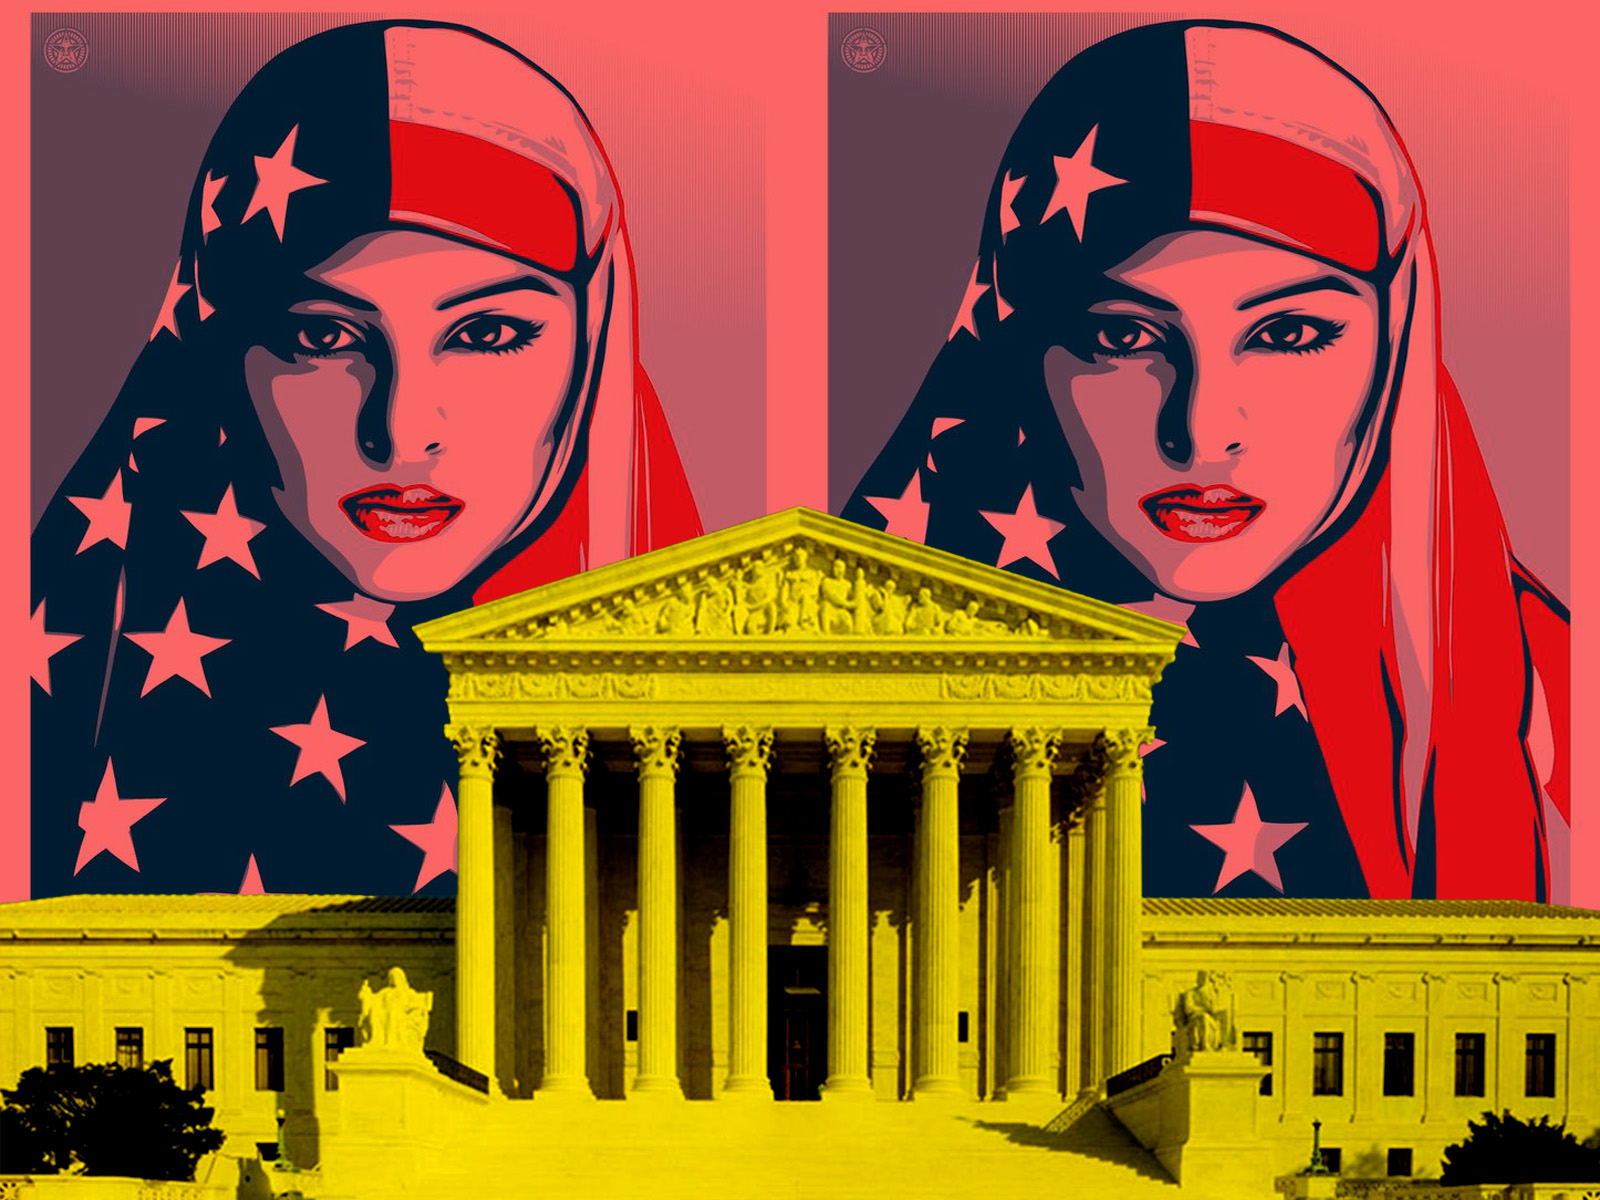 muslim ban illustration.jpg